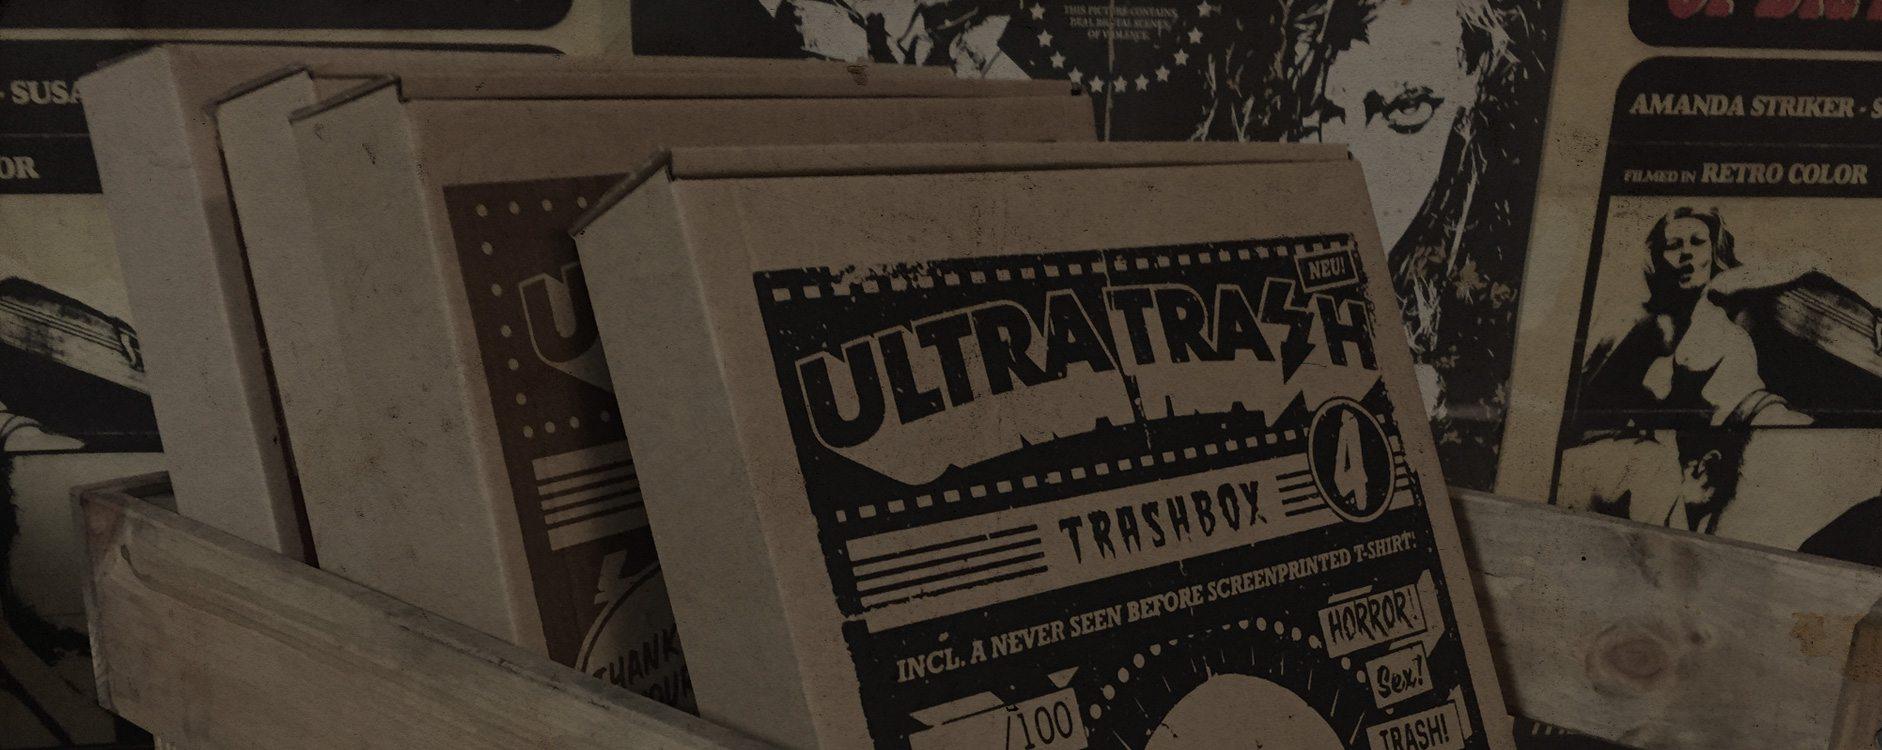 ultra-trash-trashbox-banner